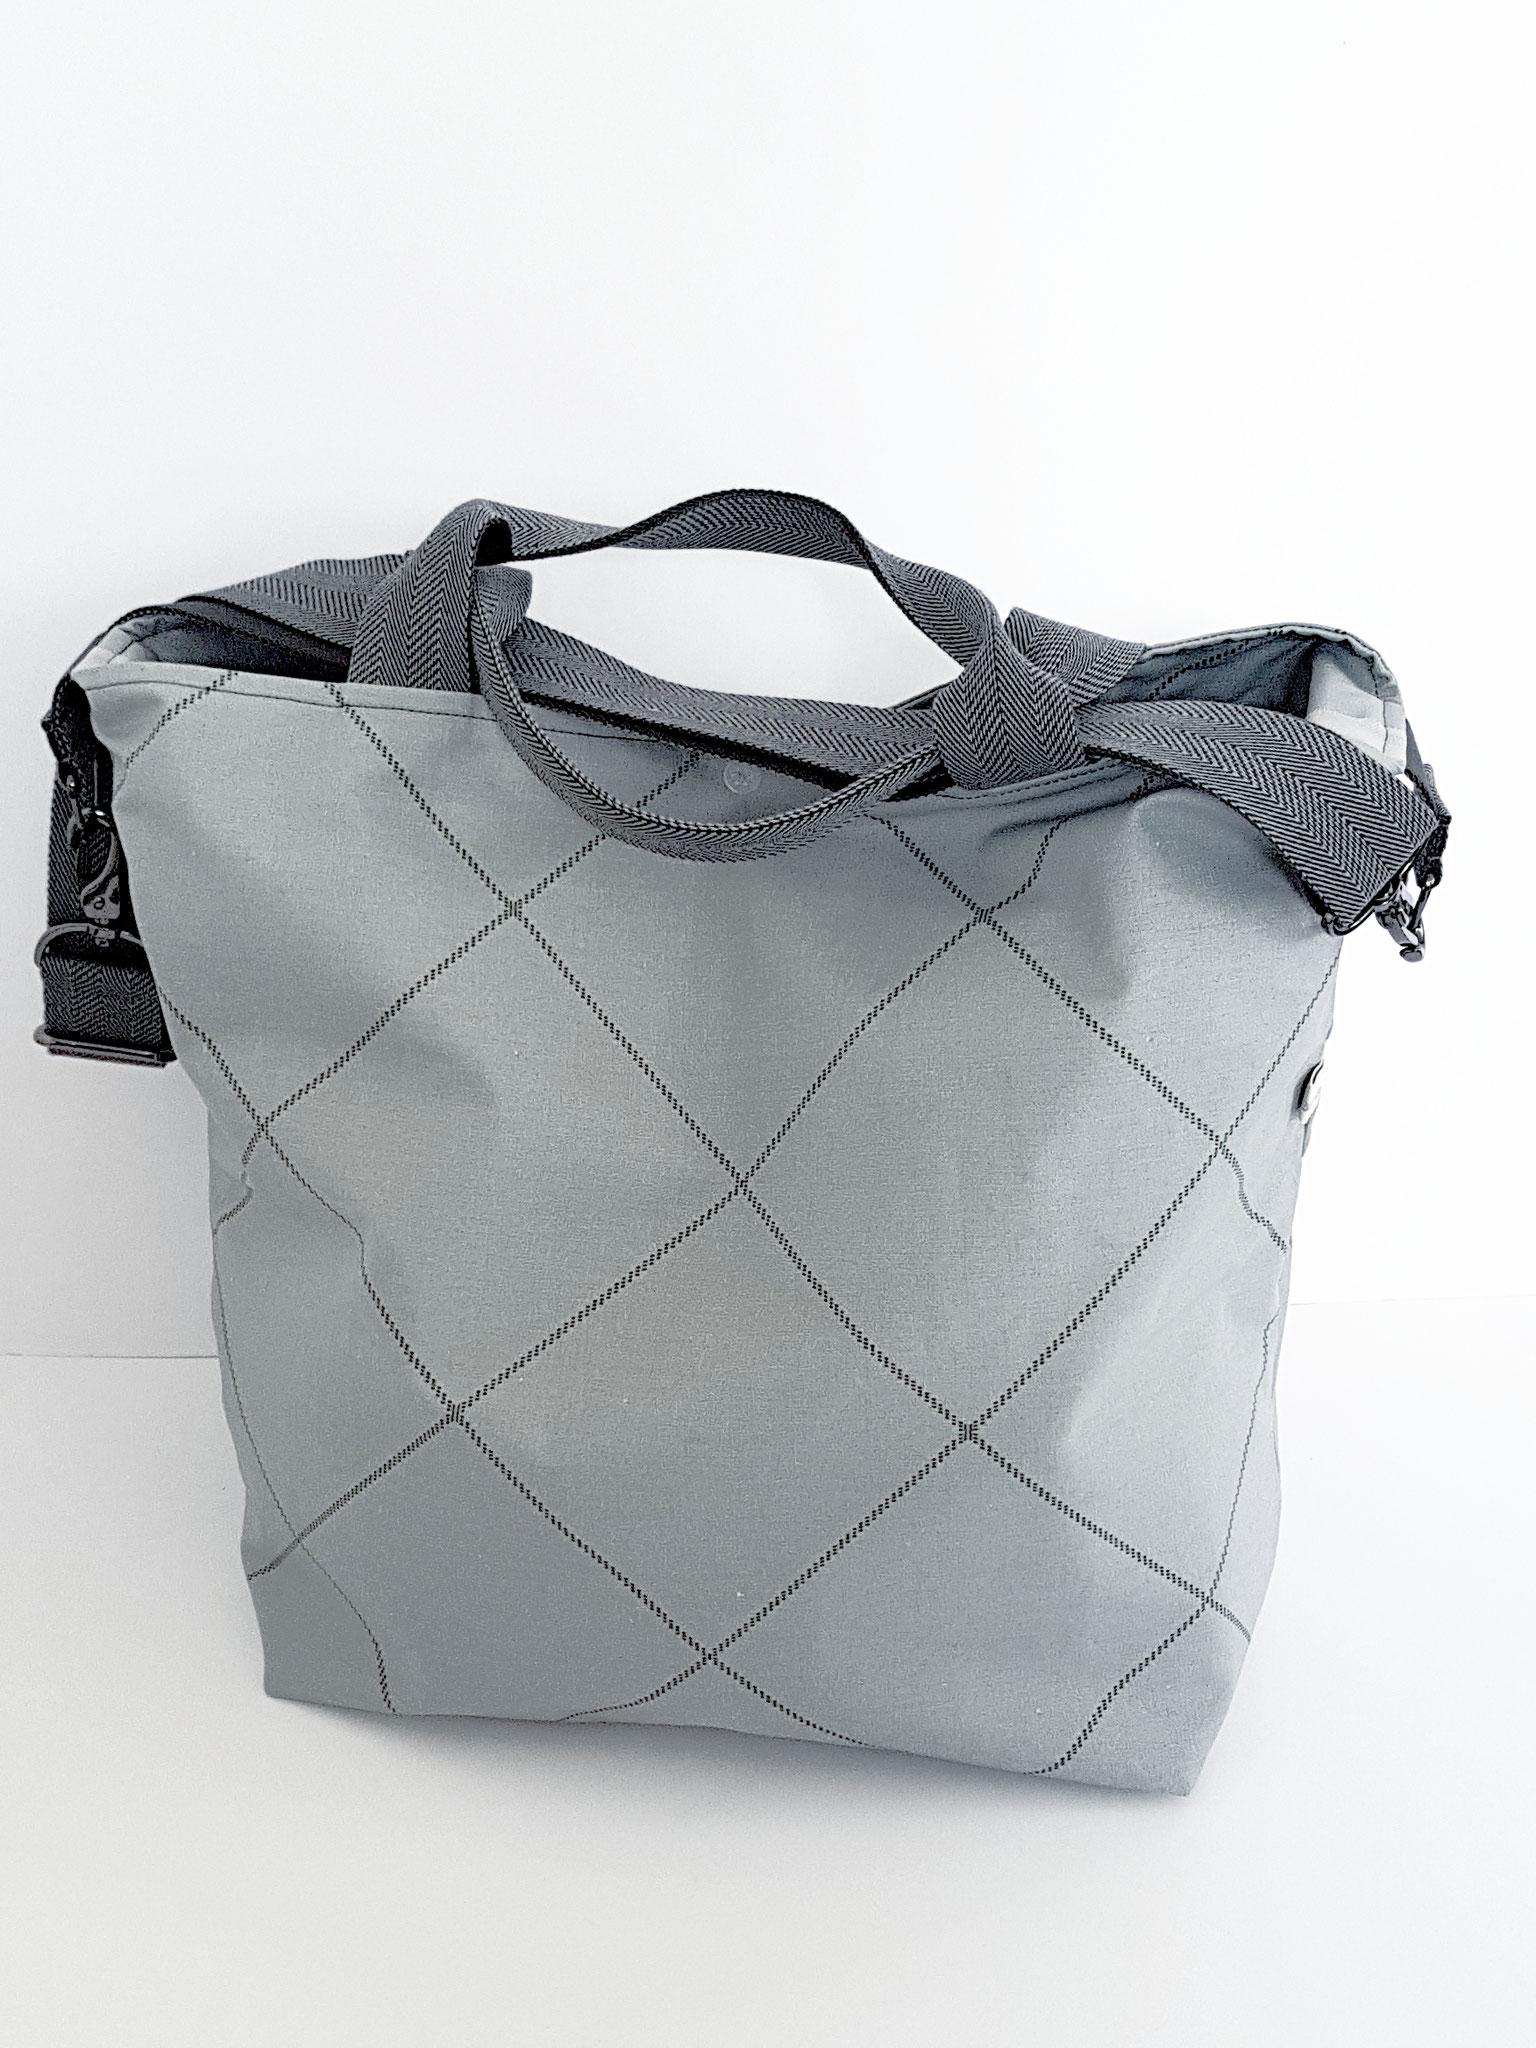 Shopper, grau-schwarz, verkauft